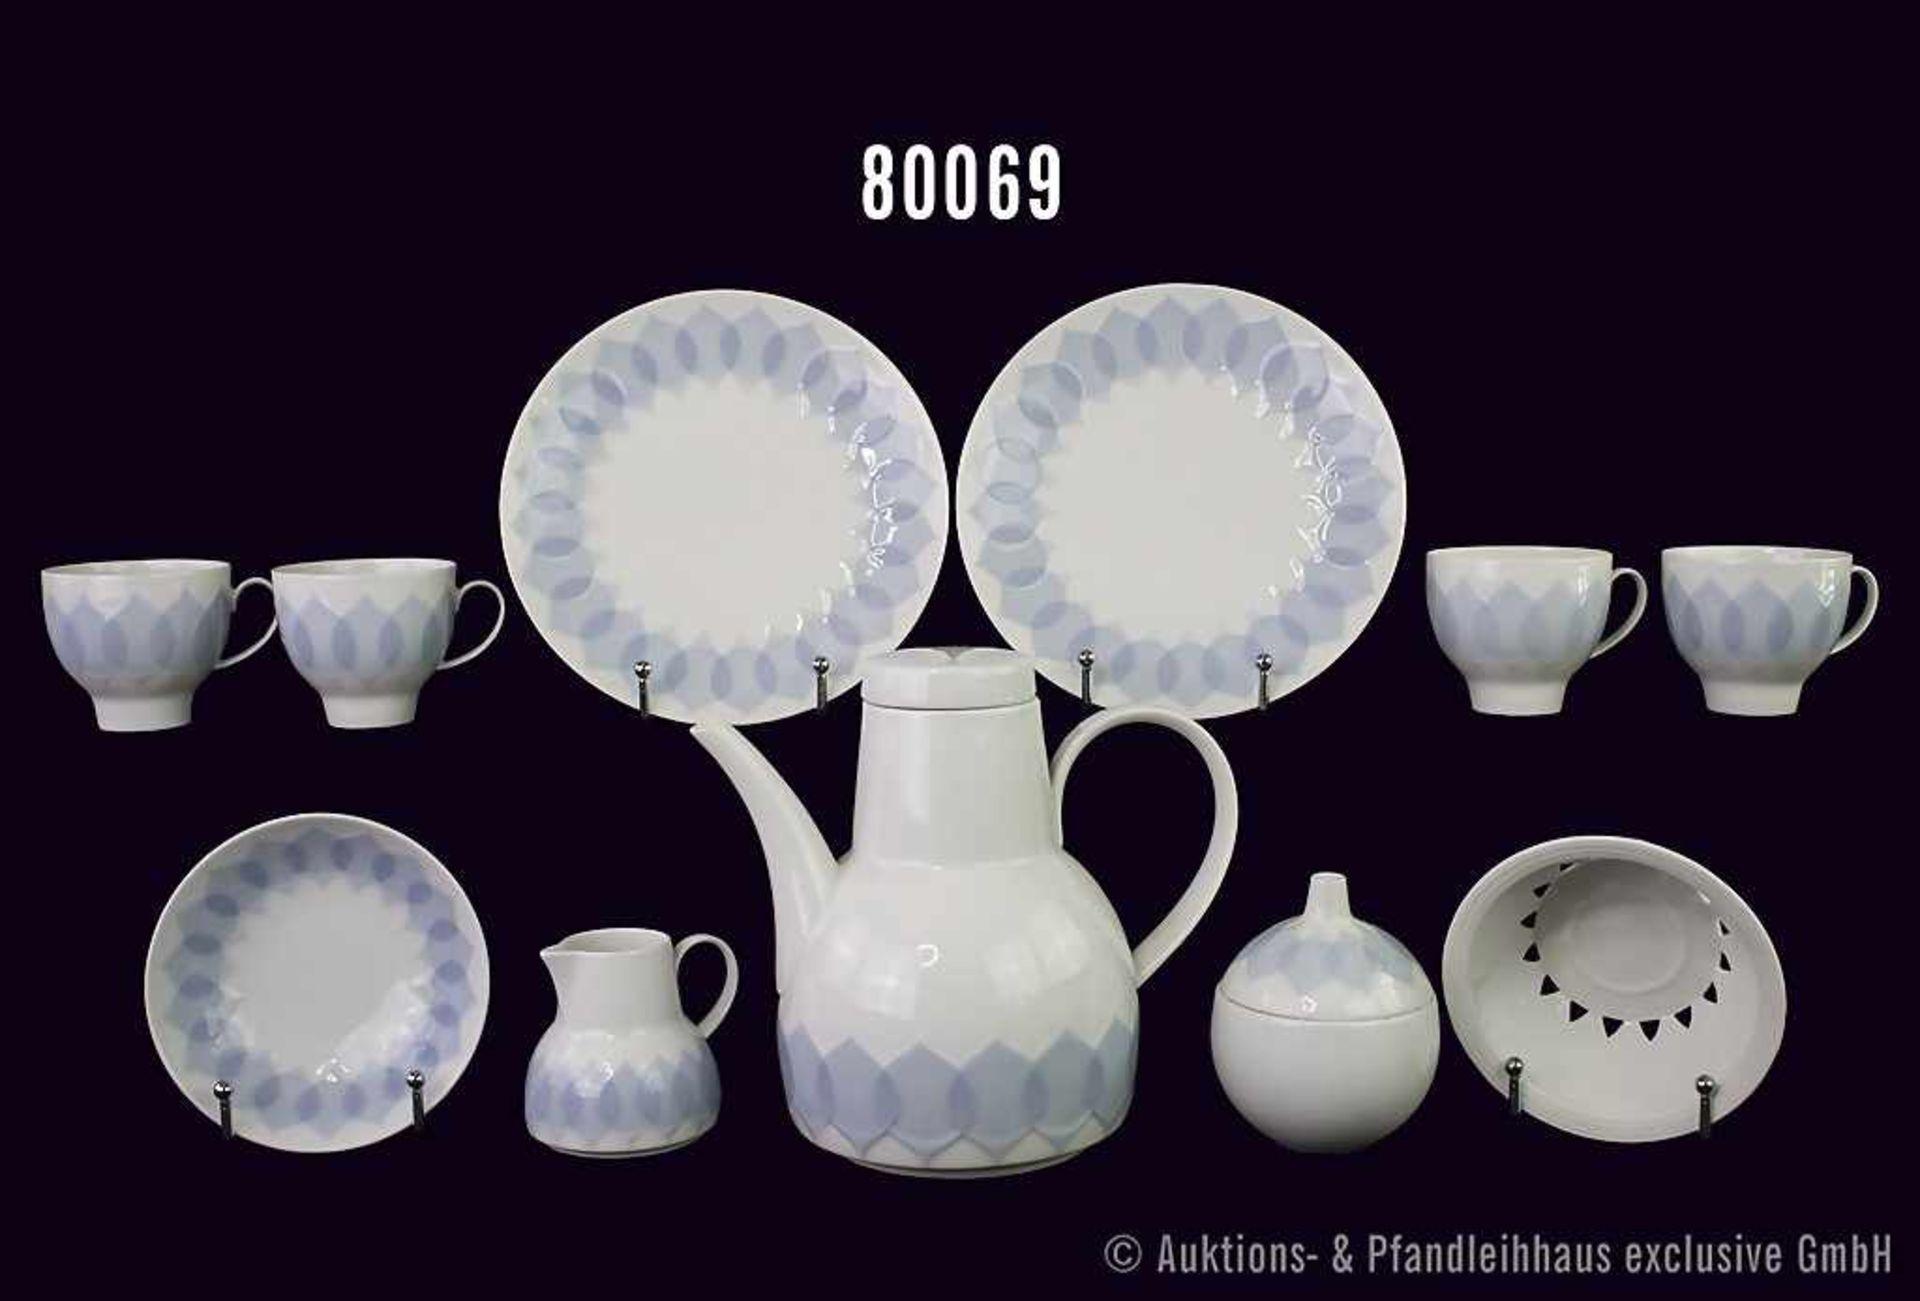 "Konv. 22 Teile Rosenthal Porzellan, Art ""Lotus"", Entwerfer (Form) Björn Wiinblad, Dekor Kobalt,"